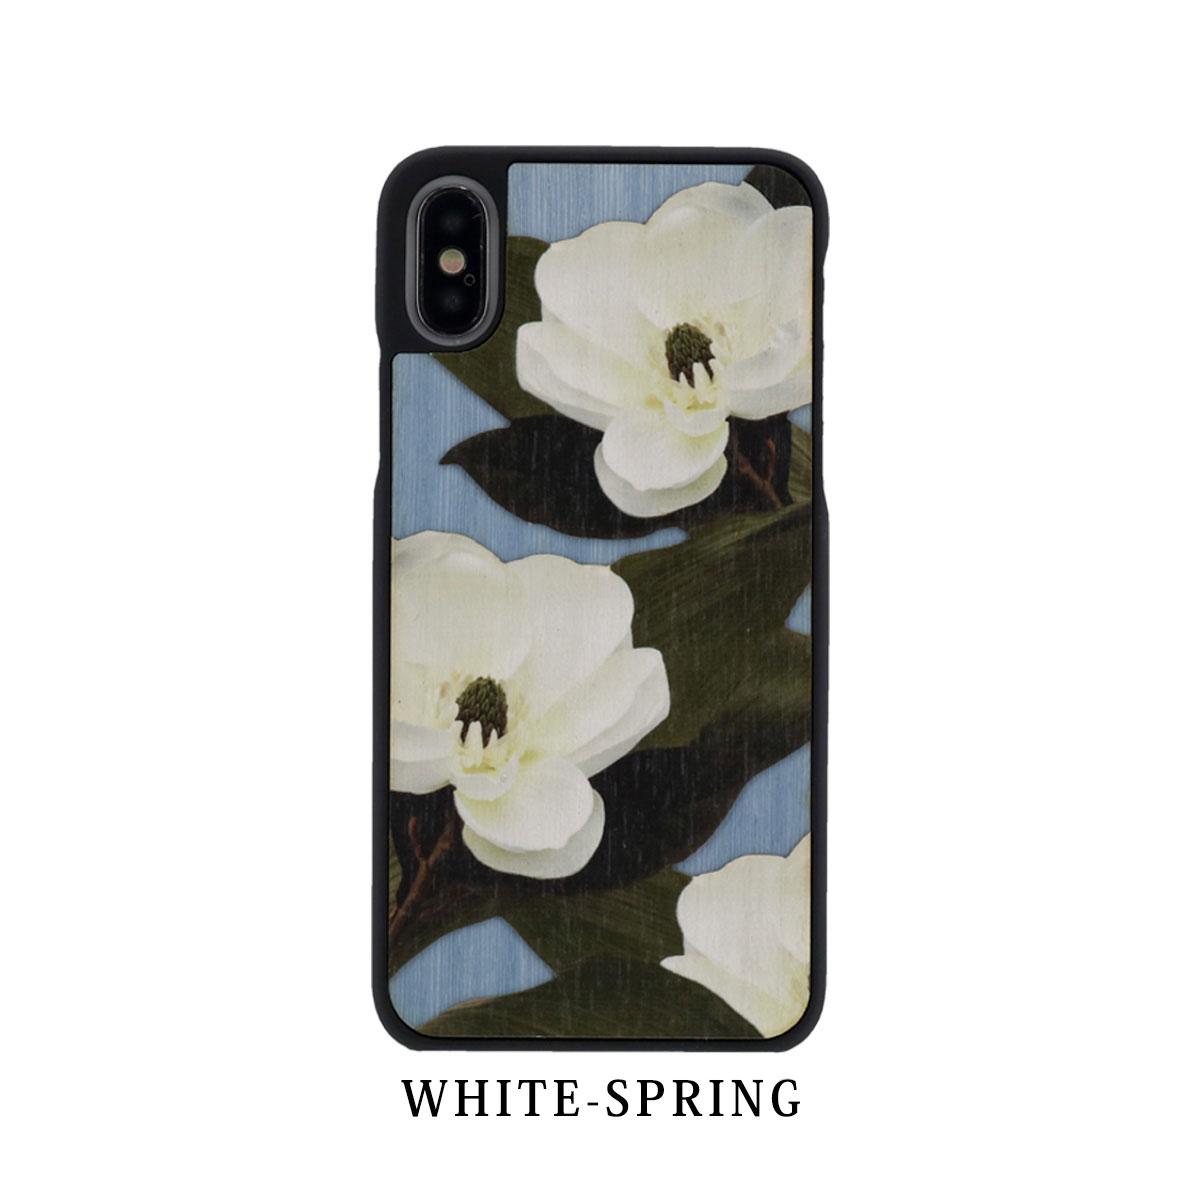 WHITE-SPRING